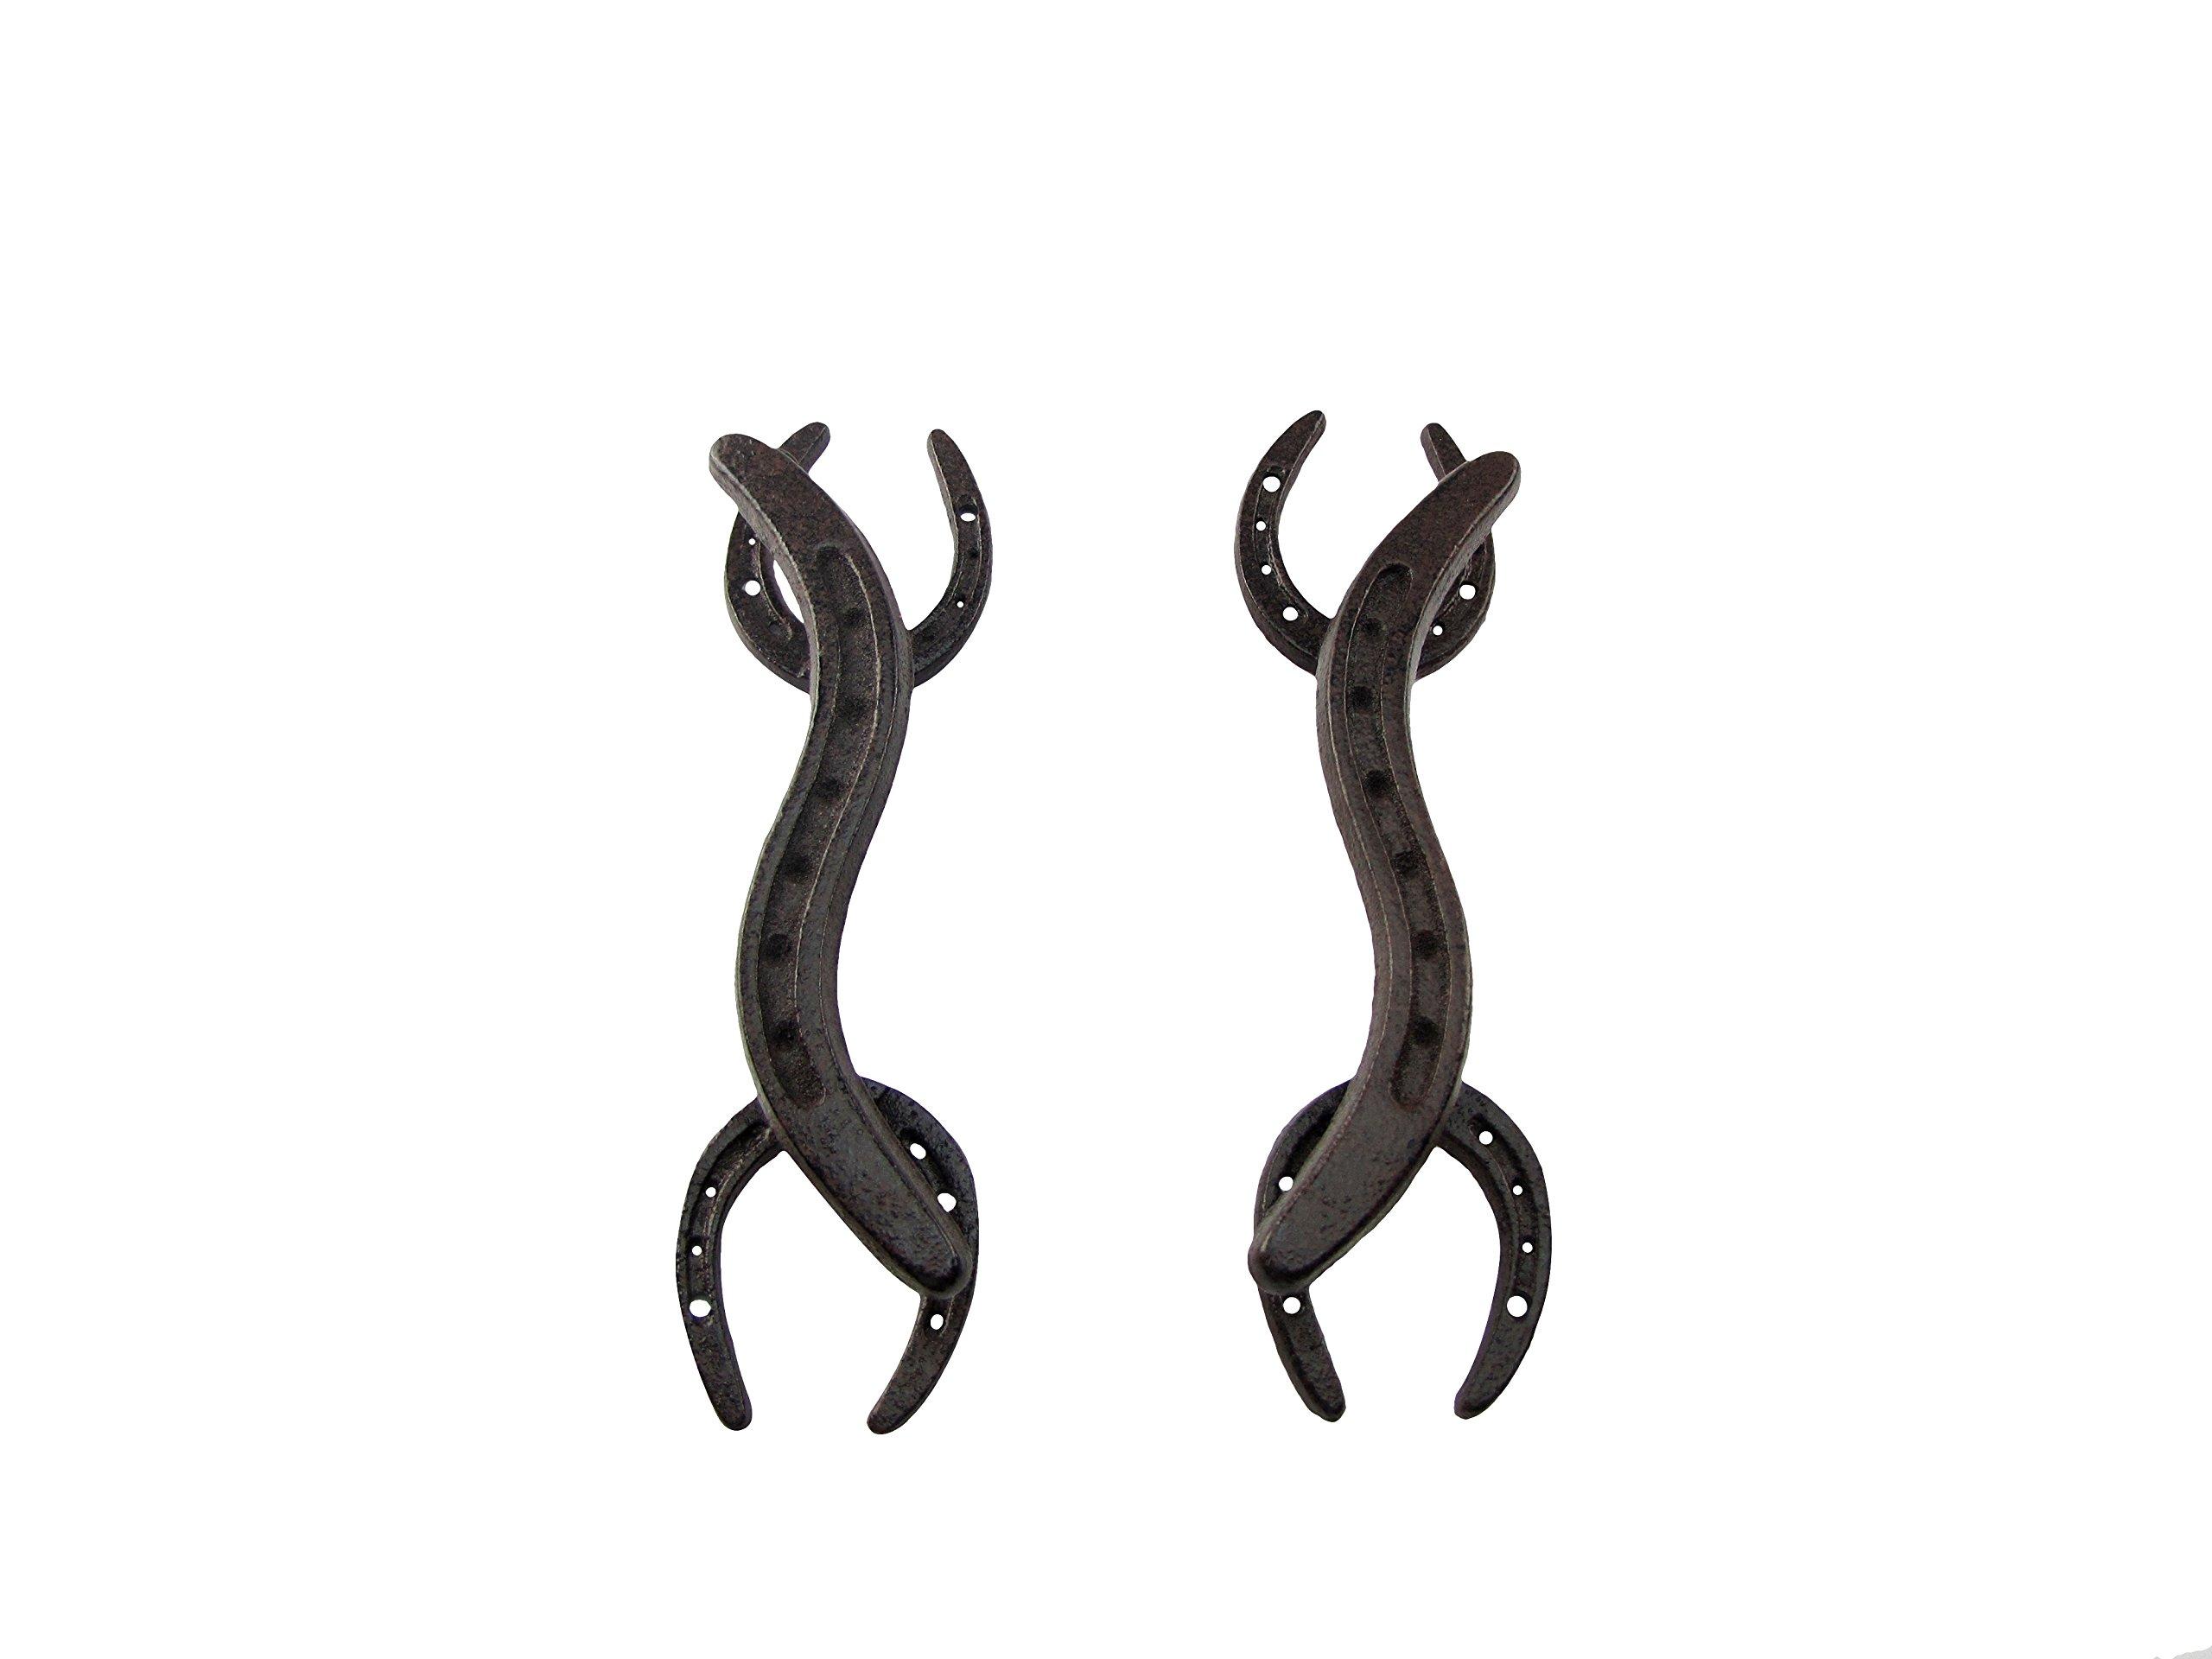 Set of 2 Metal Horseshoe Door Drawer Pull Handles Gate, Shed, or Barn Hardware